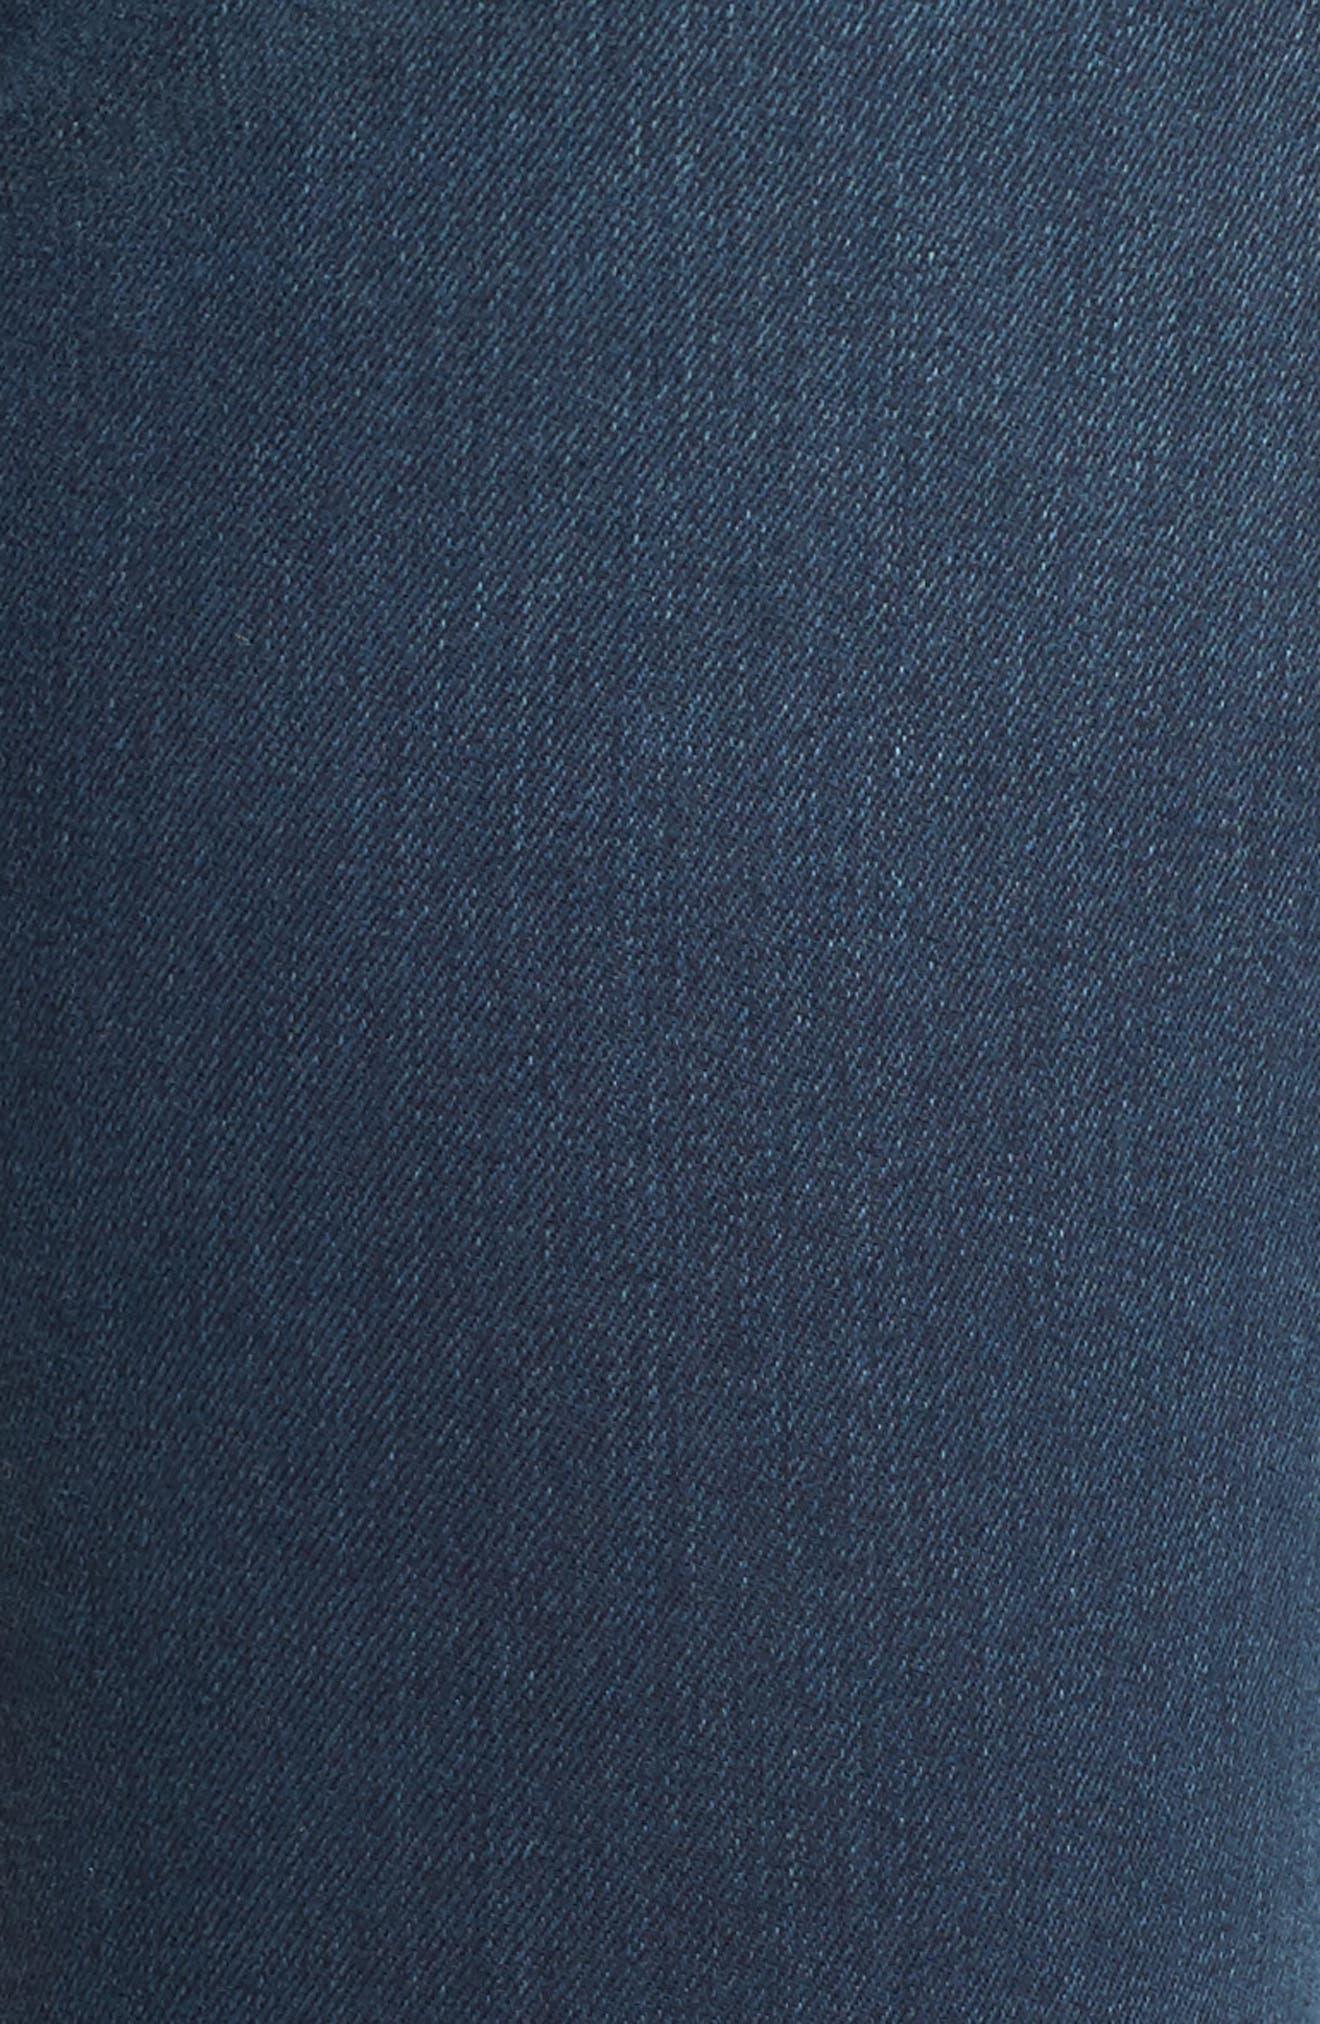 Ami Stretch Super Skinny Jeans,                             Alternate thumbnail 5, color,                             Rome